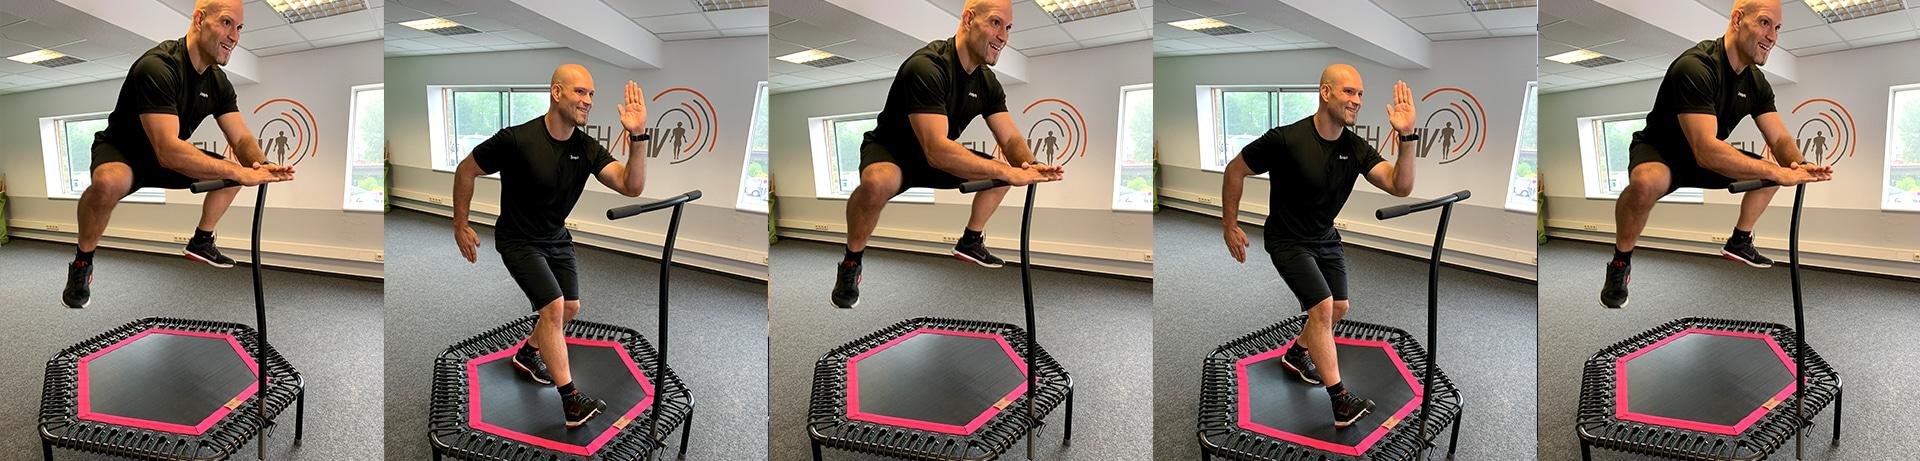 Jumping Fitness – Rehaktiv Engelskirchen